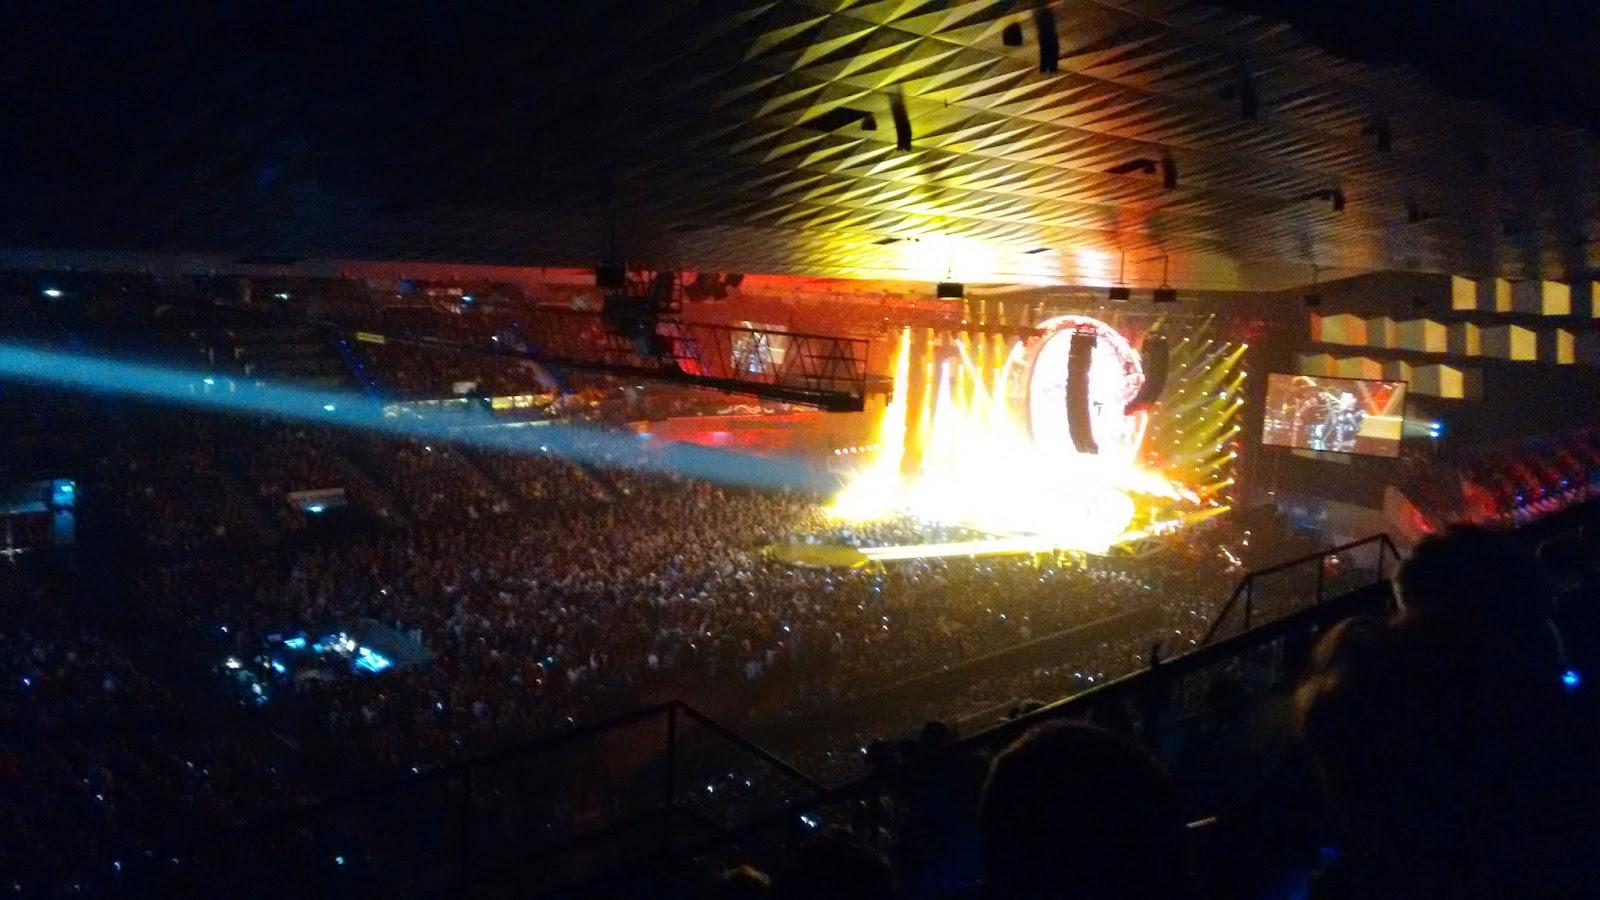 Queen Live in Vienna Wien 2015